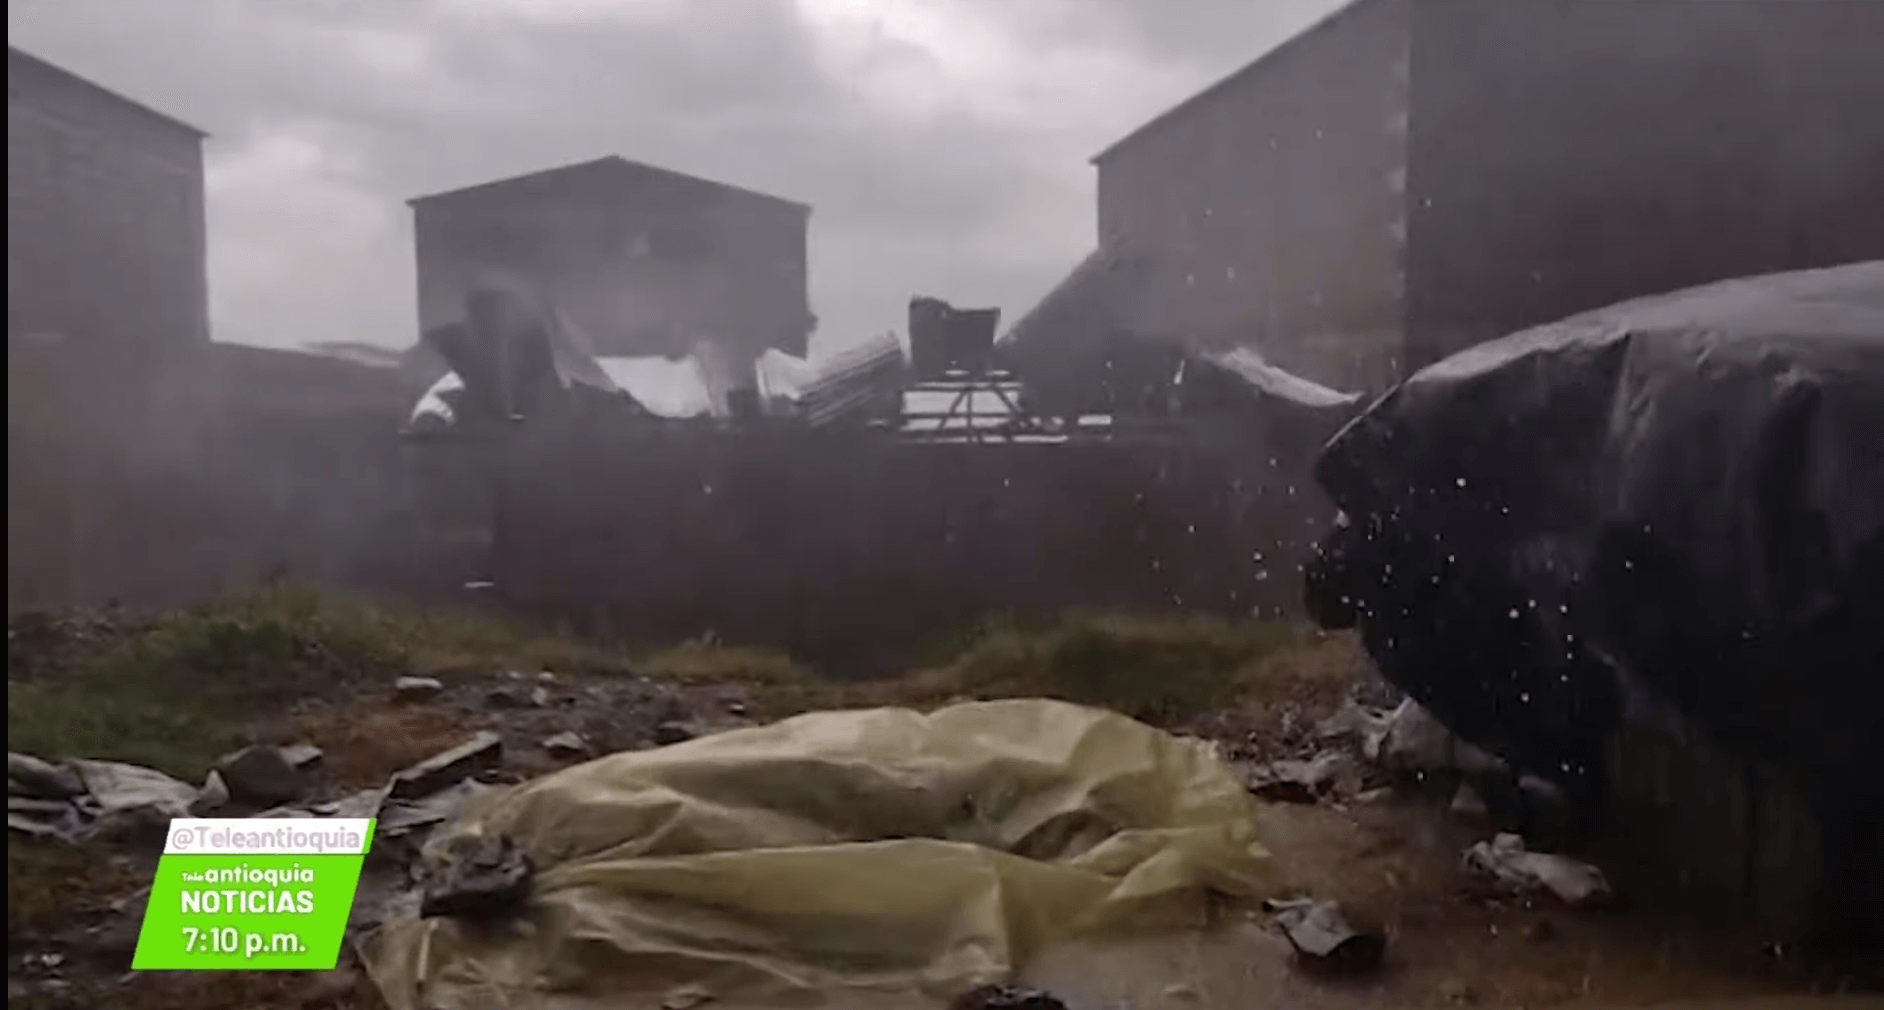 Emergencia: vendaval dejó varias viviendas destechadas